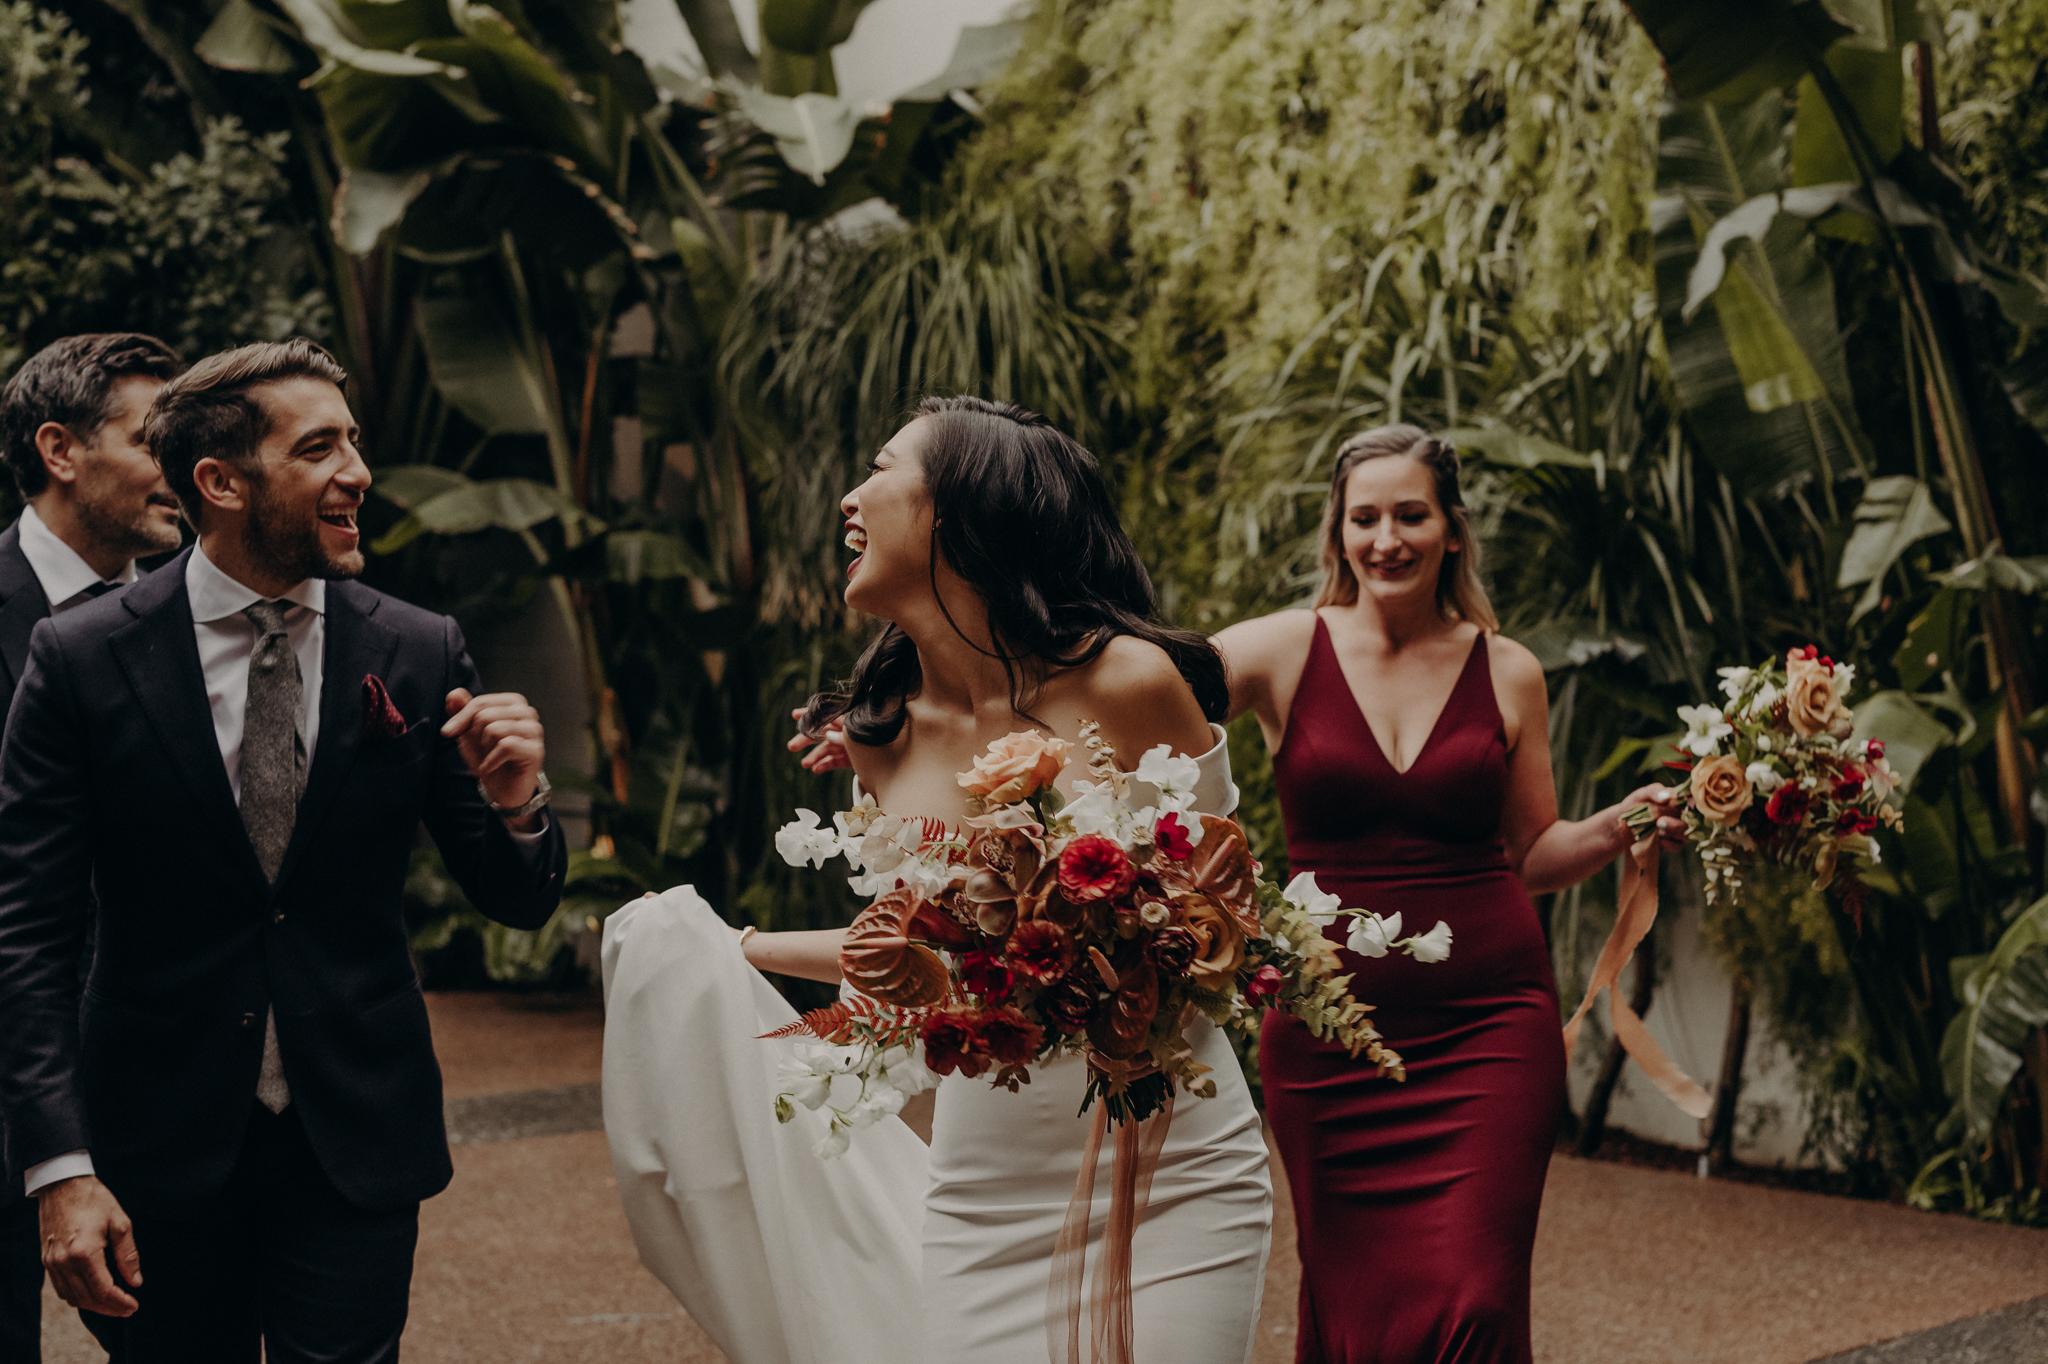 Wedding Photo LA - wedding photographer in los angeles - millwick wedding venue -isaiahandtaylor.com-060.jpg